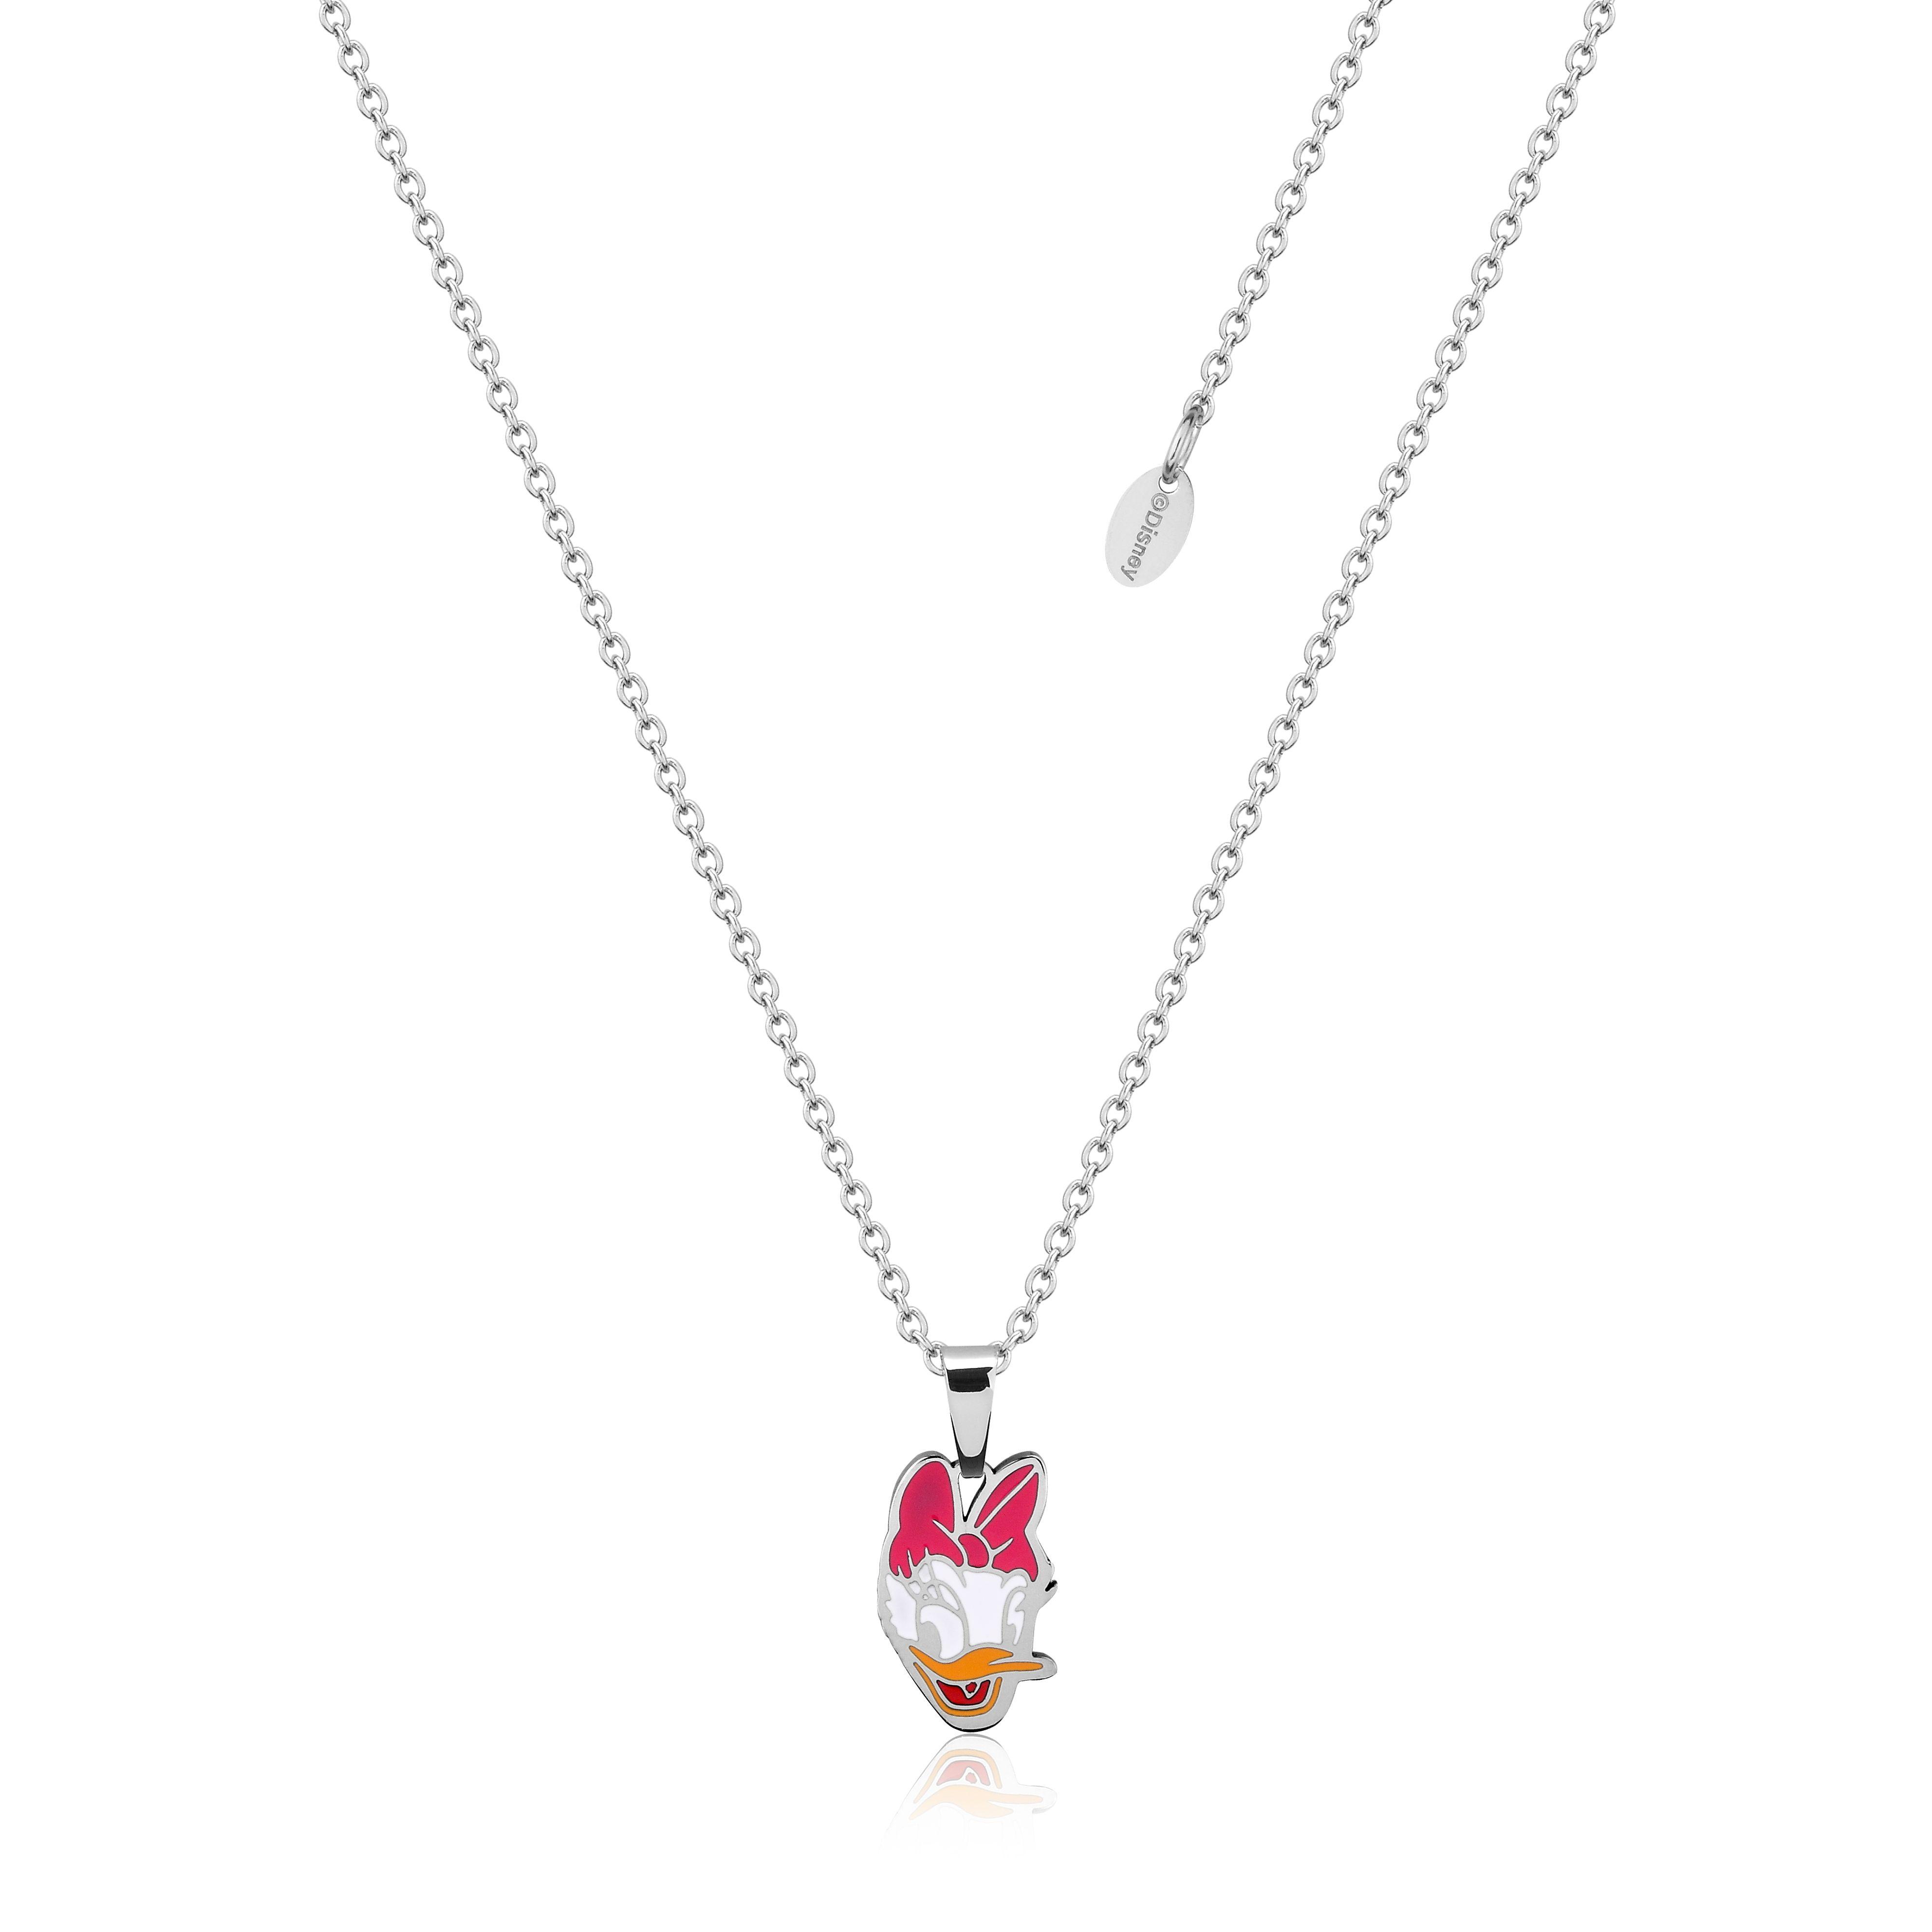 DISNEY Stainless Steel 47cm Animated Daisy Duck Pendant on Chain